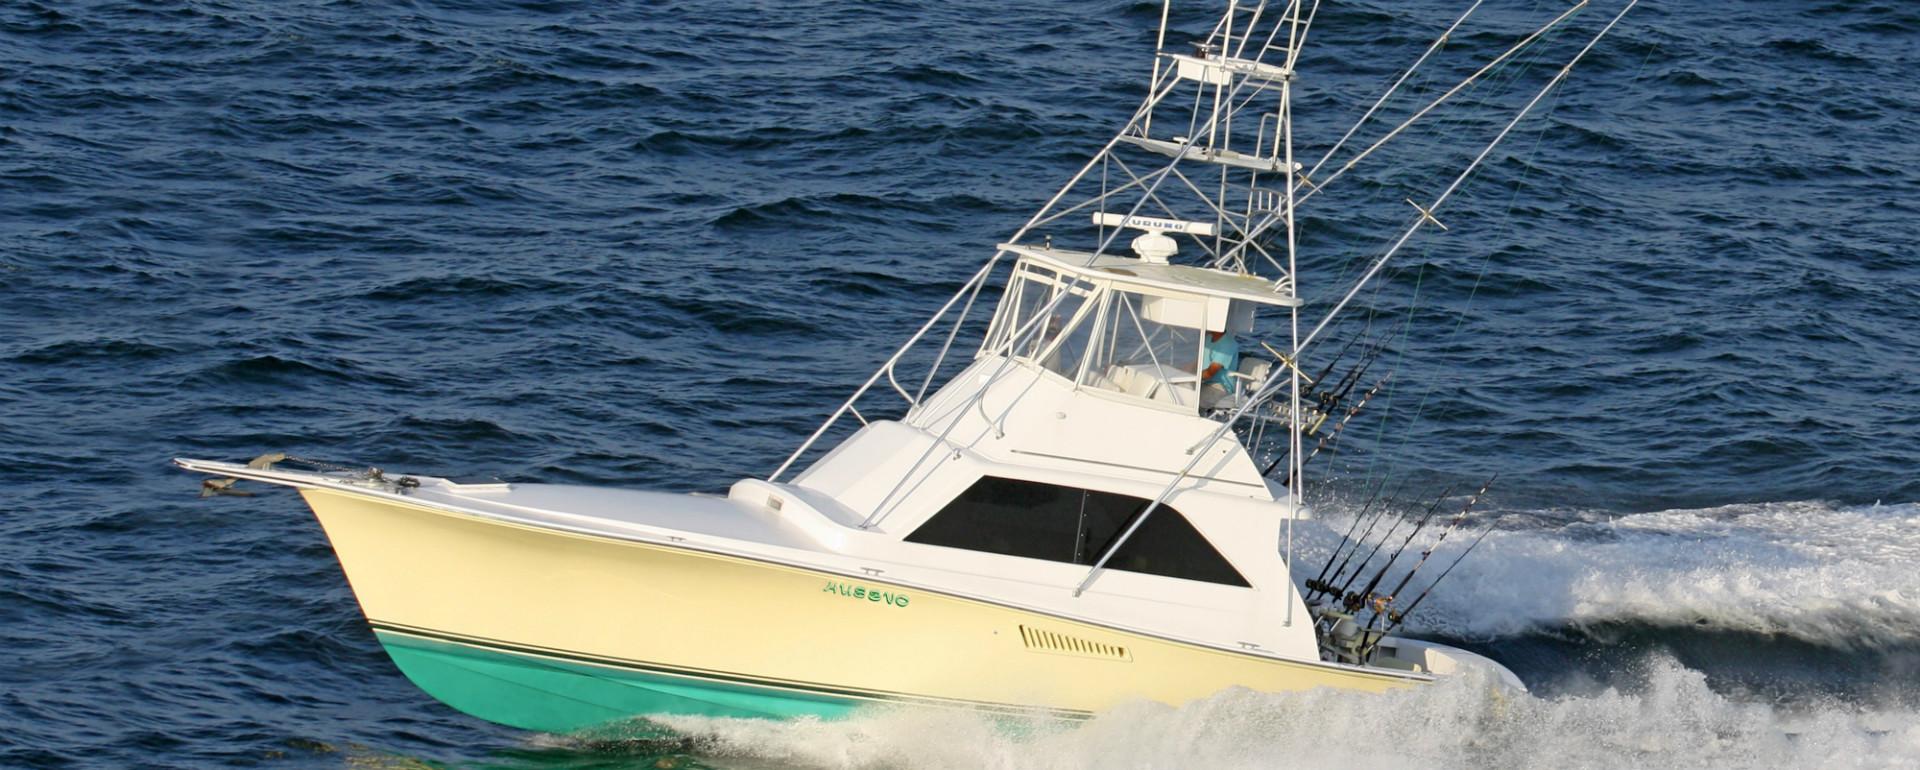 Husevo Offshore Sport Fishing: Ocean City Wreck/Bluefish